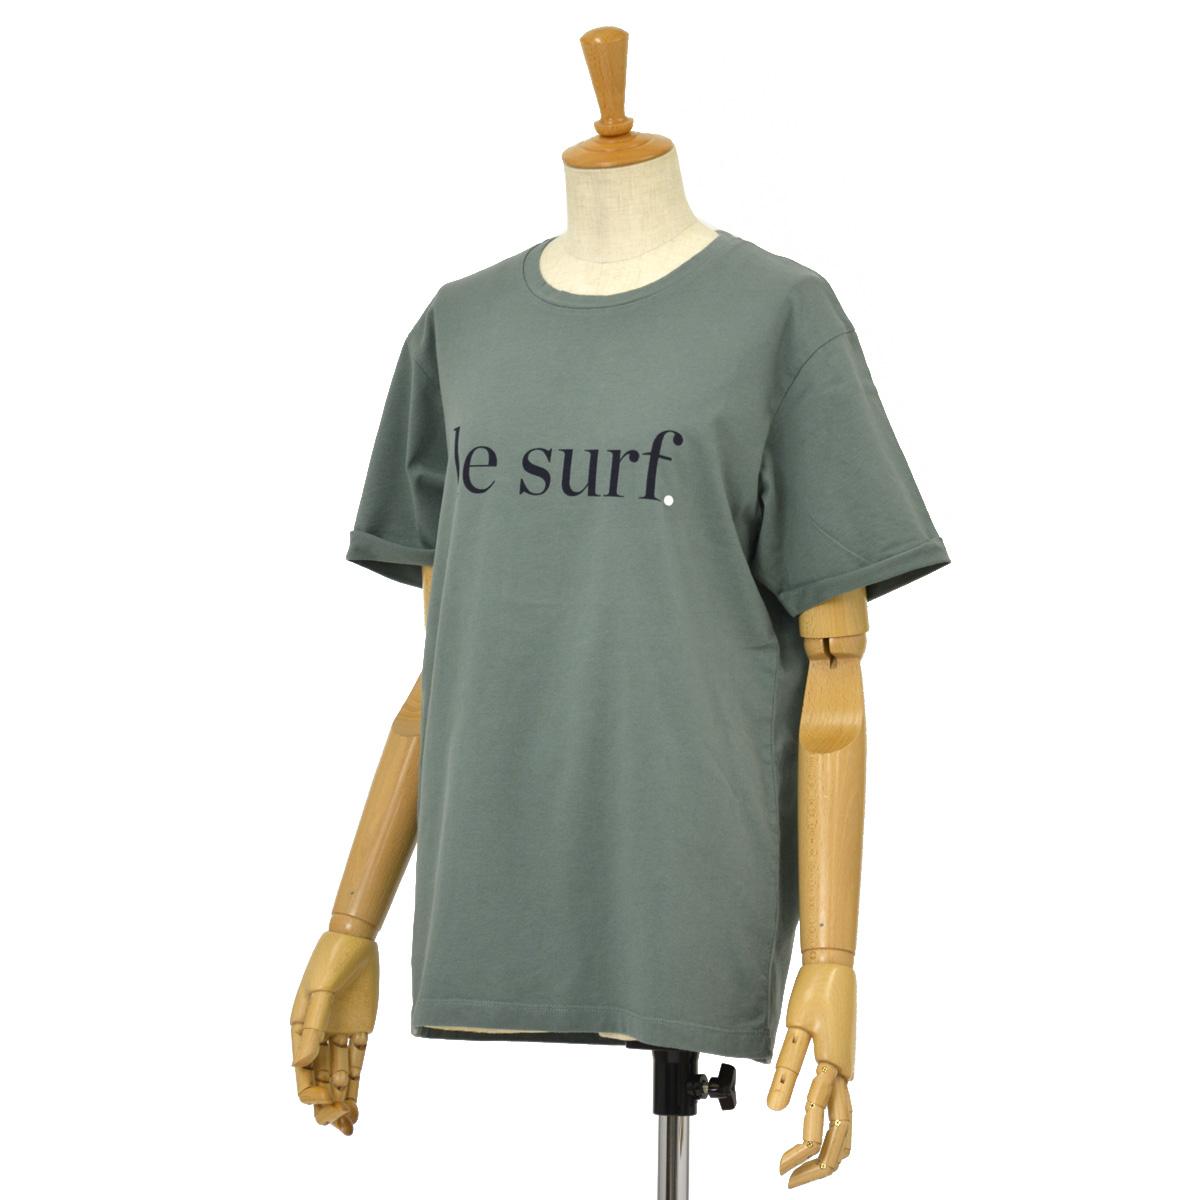 CUISSE DE GRENOUILLE【キュイス ドゥ グルヌイユ】プリントカットソー ESQUISSE 01 LE SURF コットン カーキ